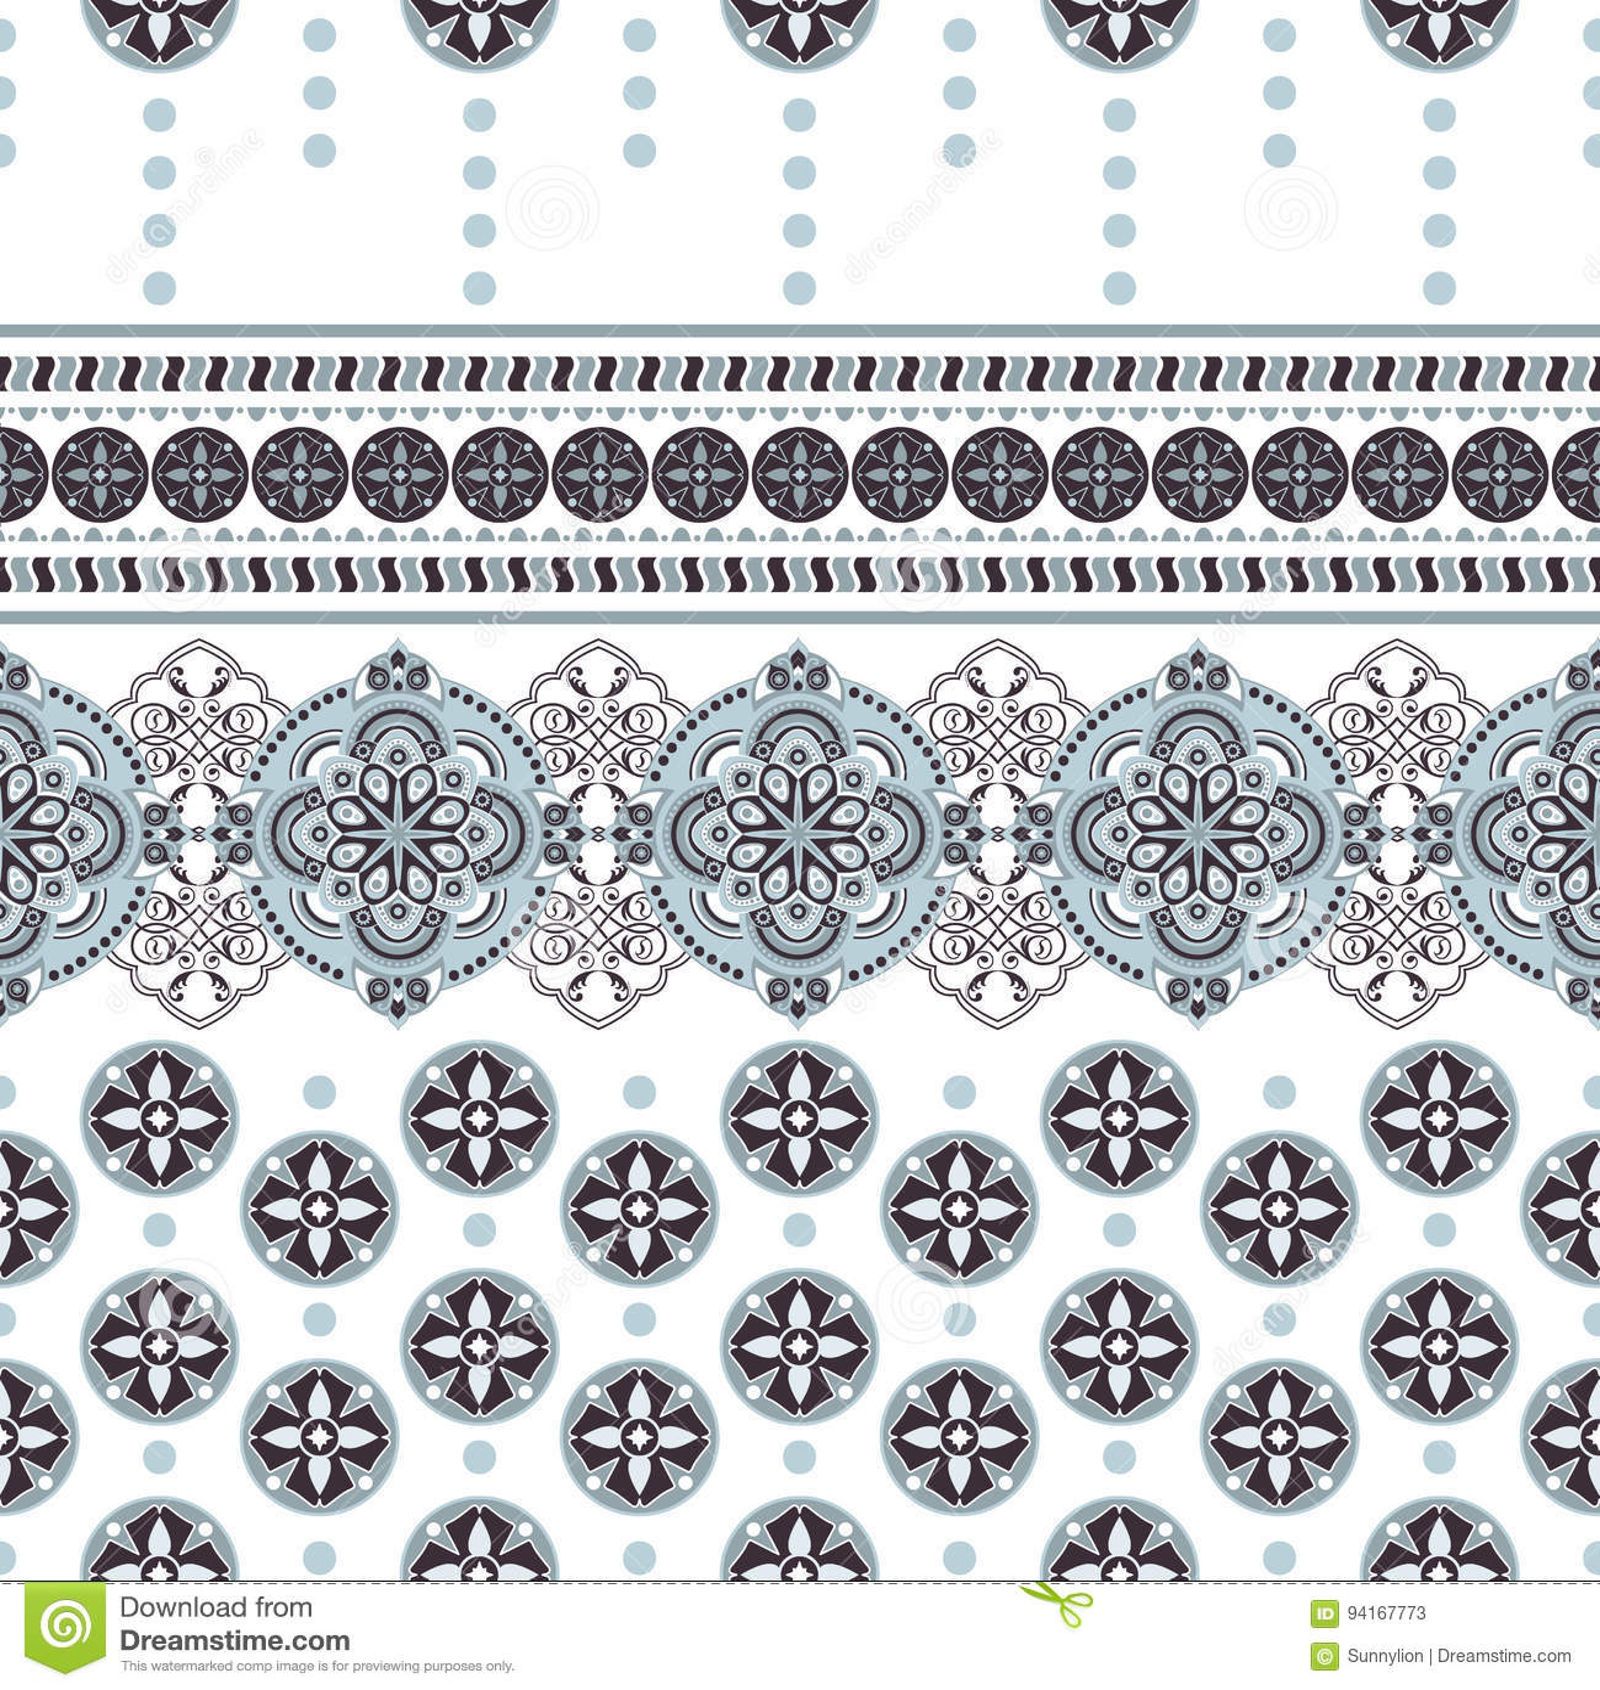 Lujo Crochet Modelo Ornamento Media Motivo - Coser Ideas Para Vender ...